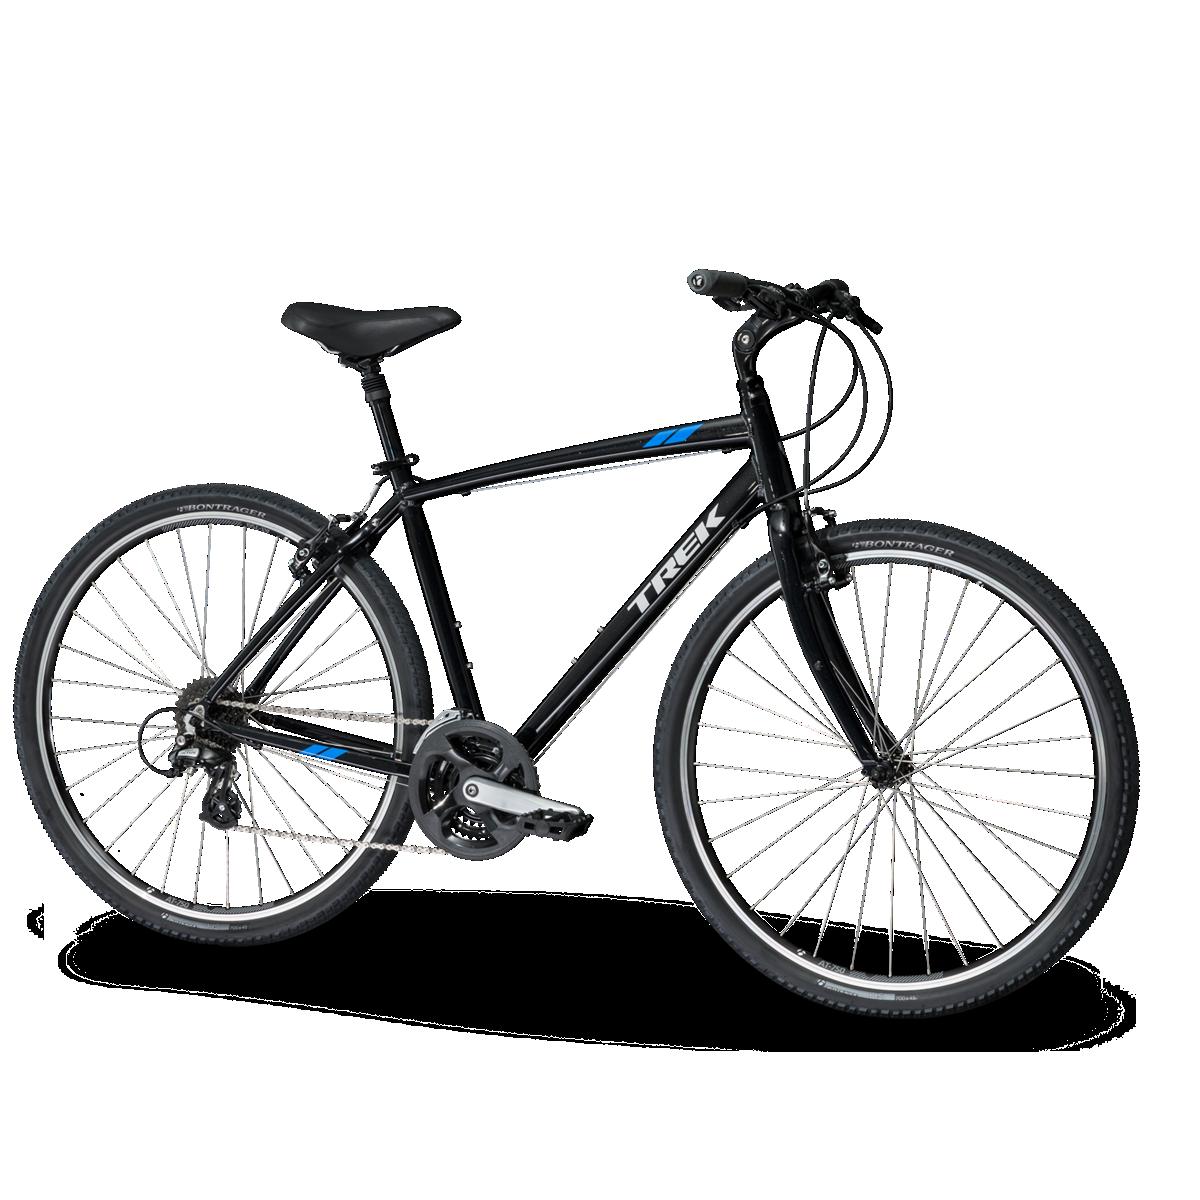 Verve Trek Bikes Trek Bikes Hybrid Bike City Bike